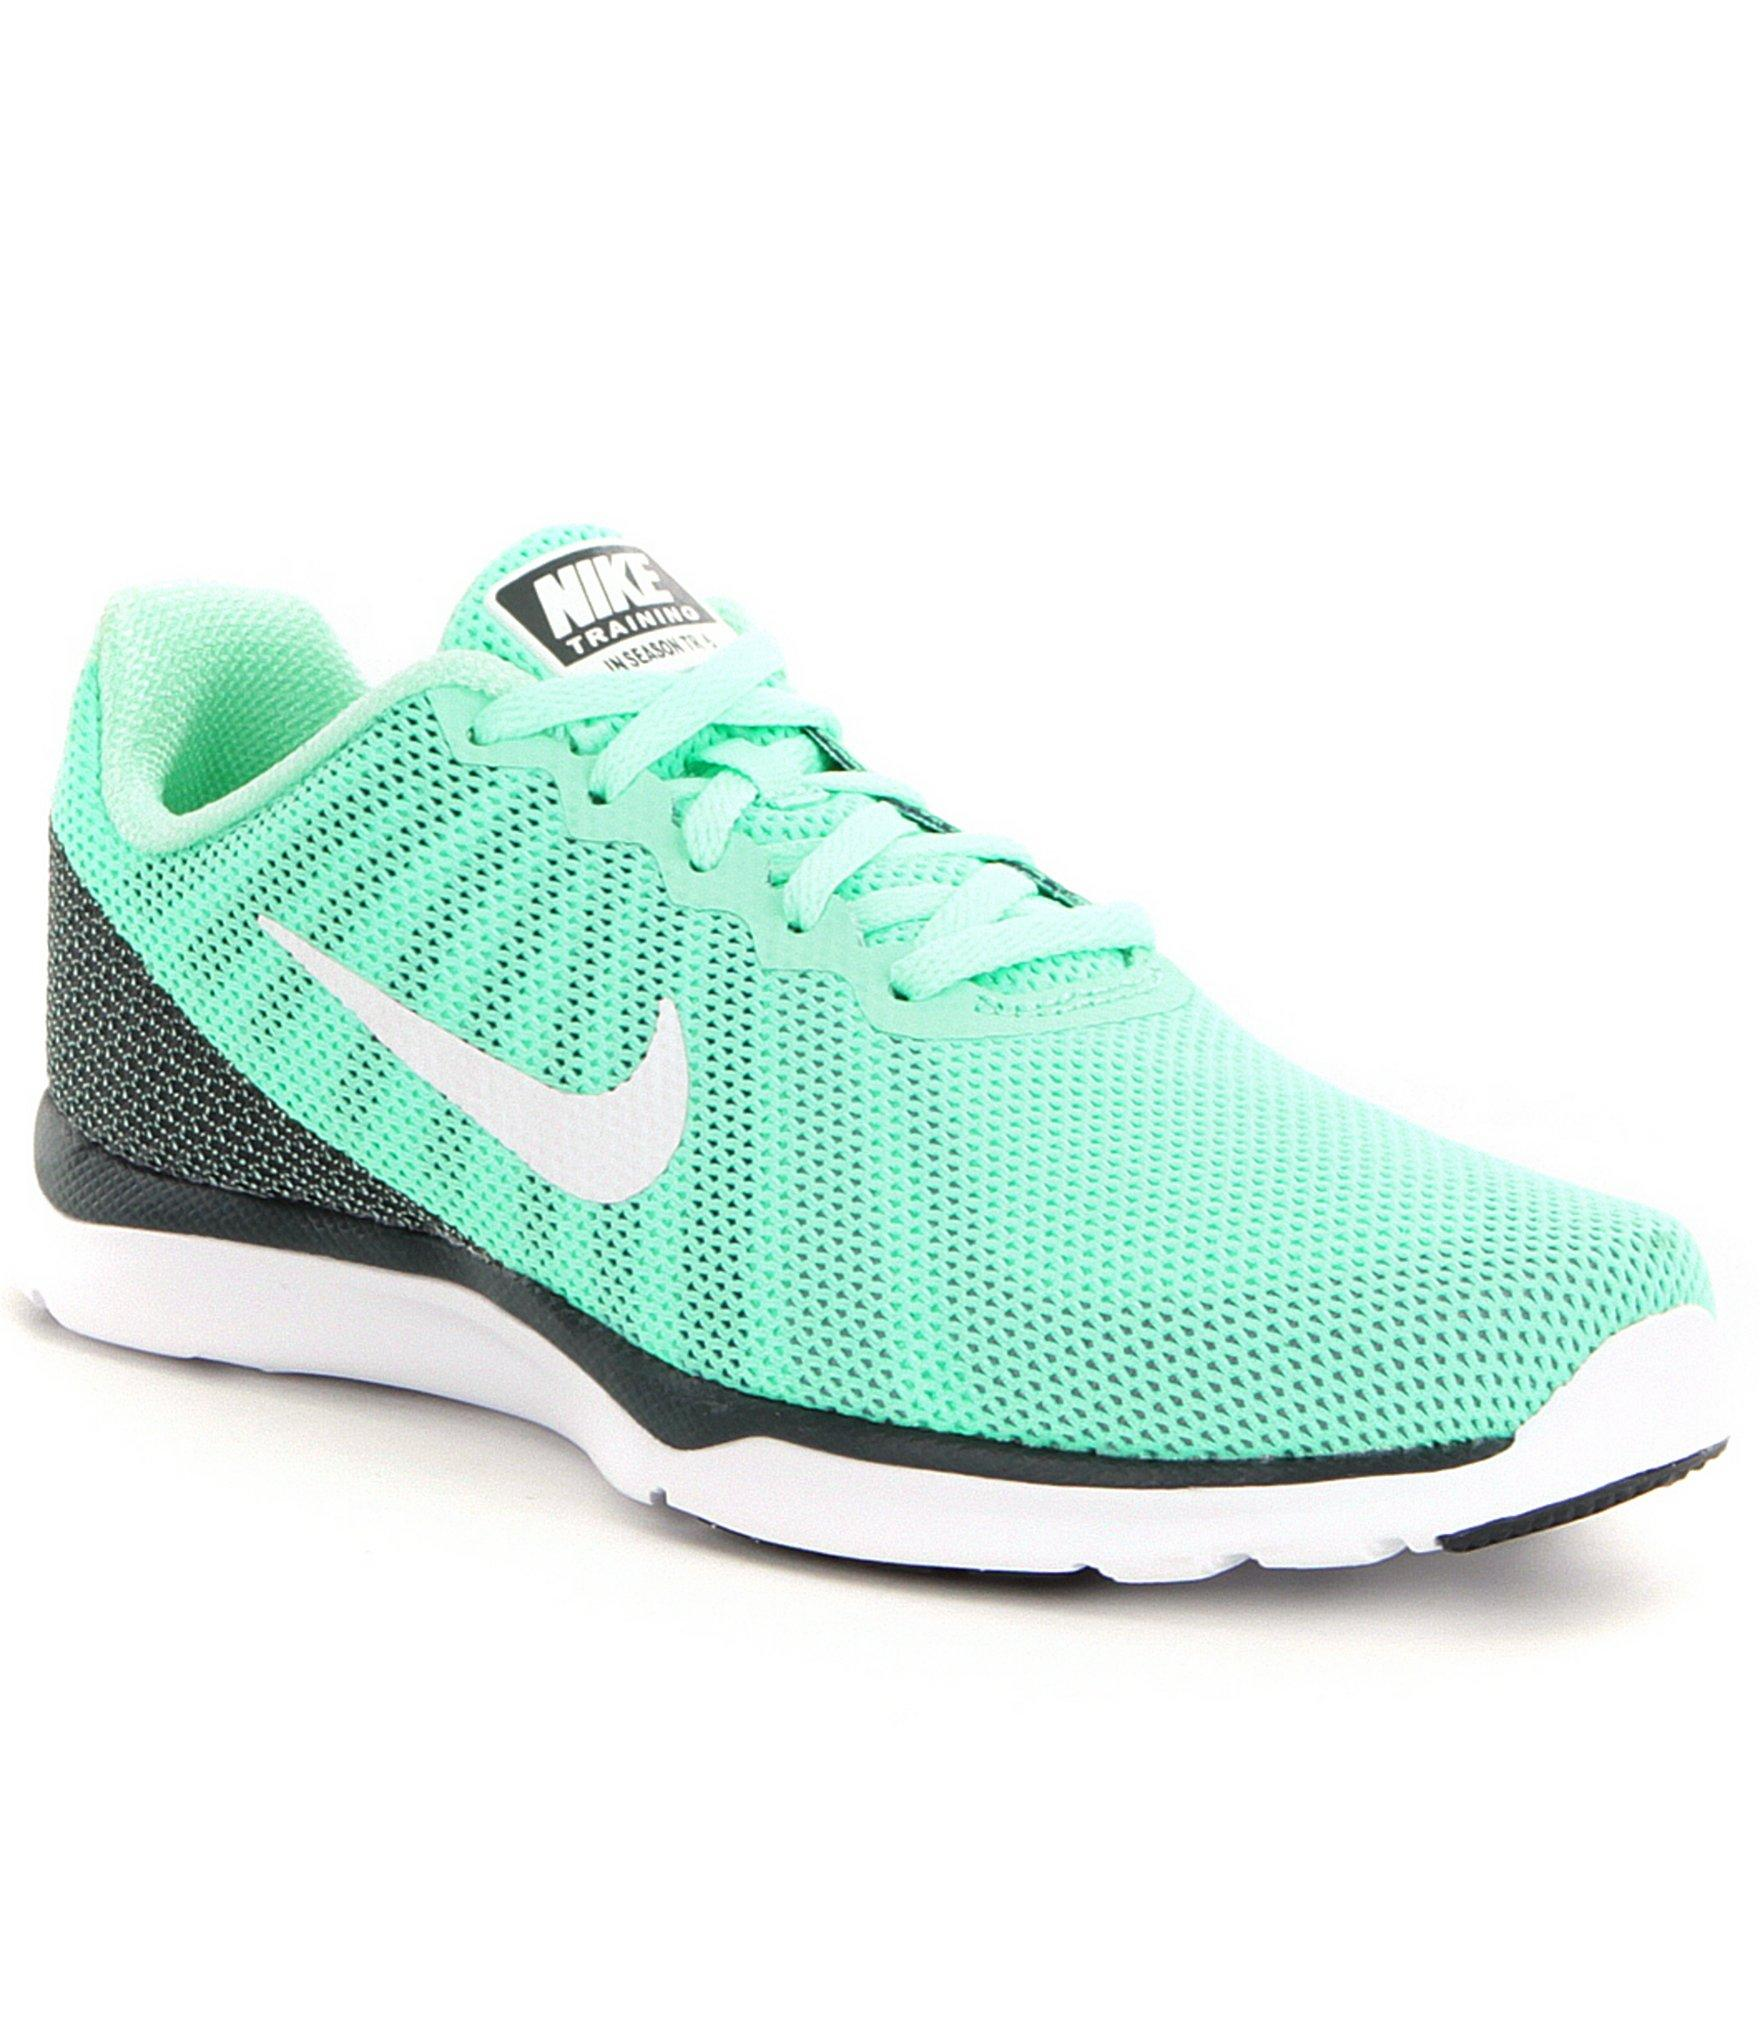 online retailer 0d248 7ccfb Nike Women ́s In-season Tr 6 Training Shoes in Green - Lyst